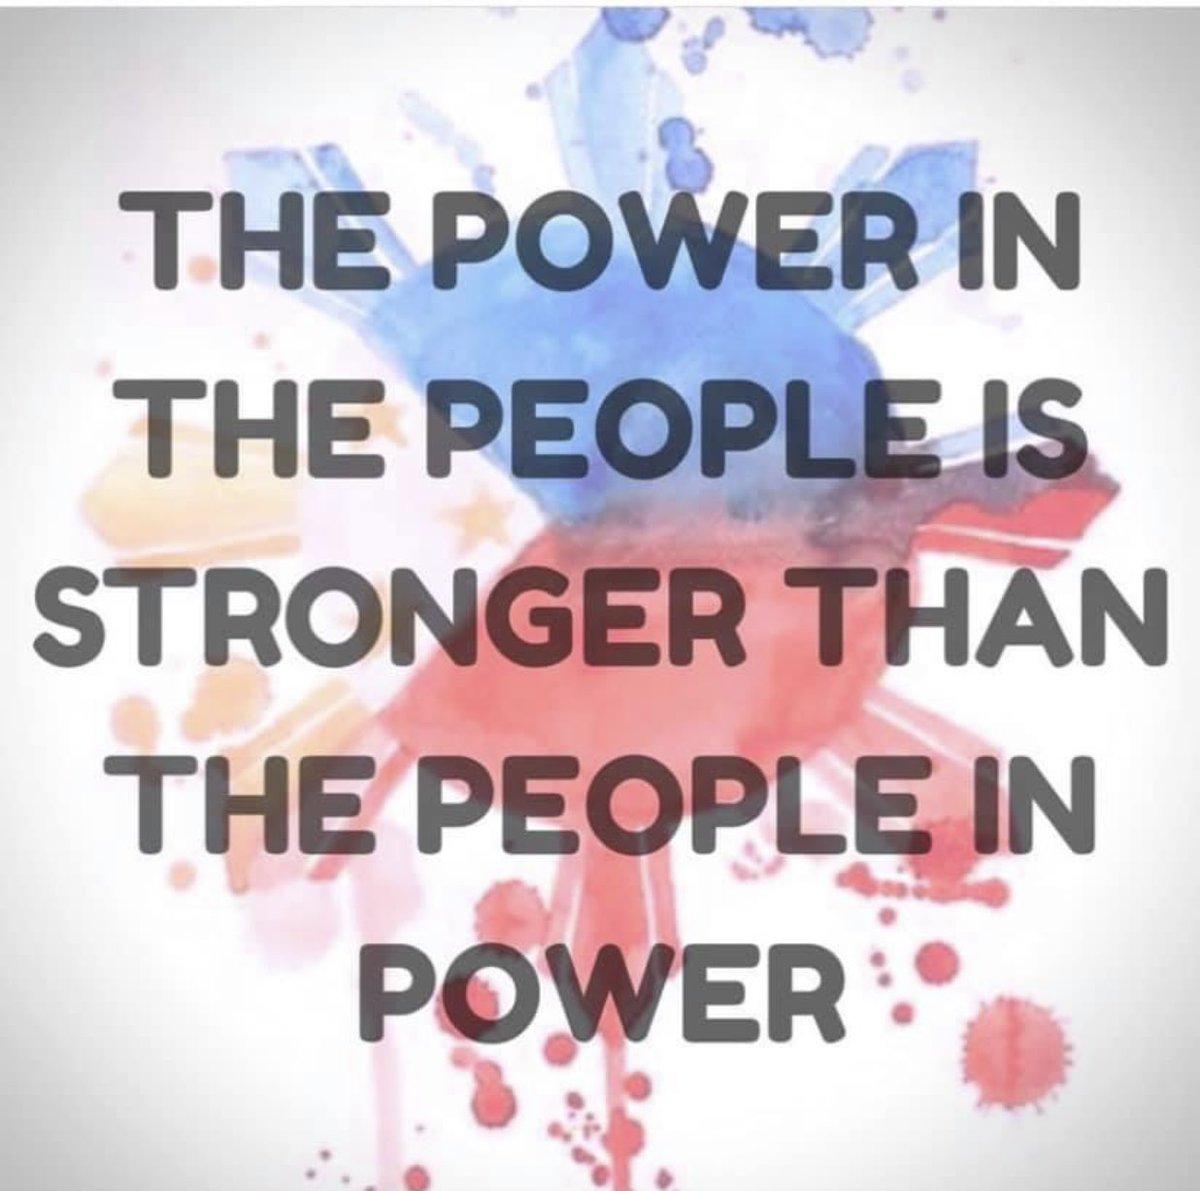 #EDSA #PeoplePower #WeRemember